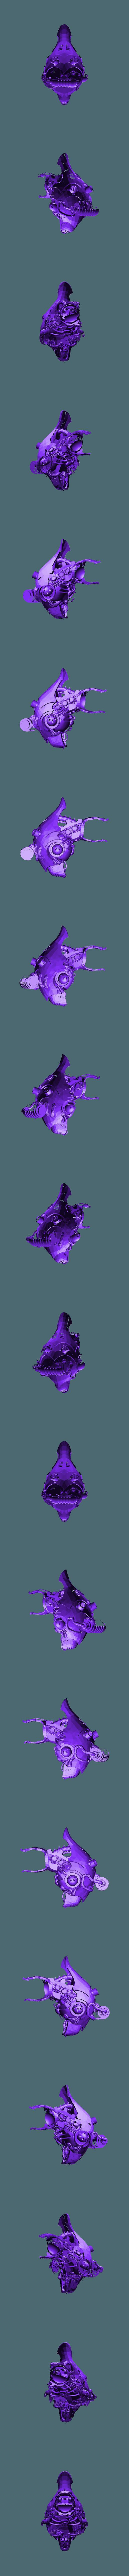 Grimdark_Kastelan_body.stl Download free STL file Grimdark Chrono Trigger Bits • 3D printer object, ErikTheHeretek